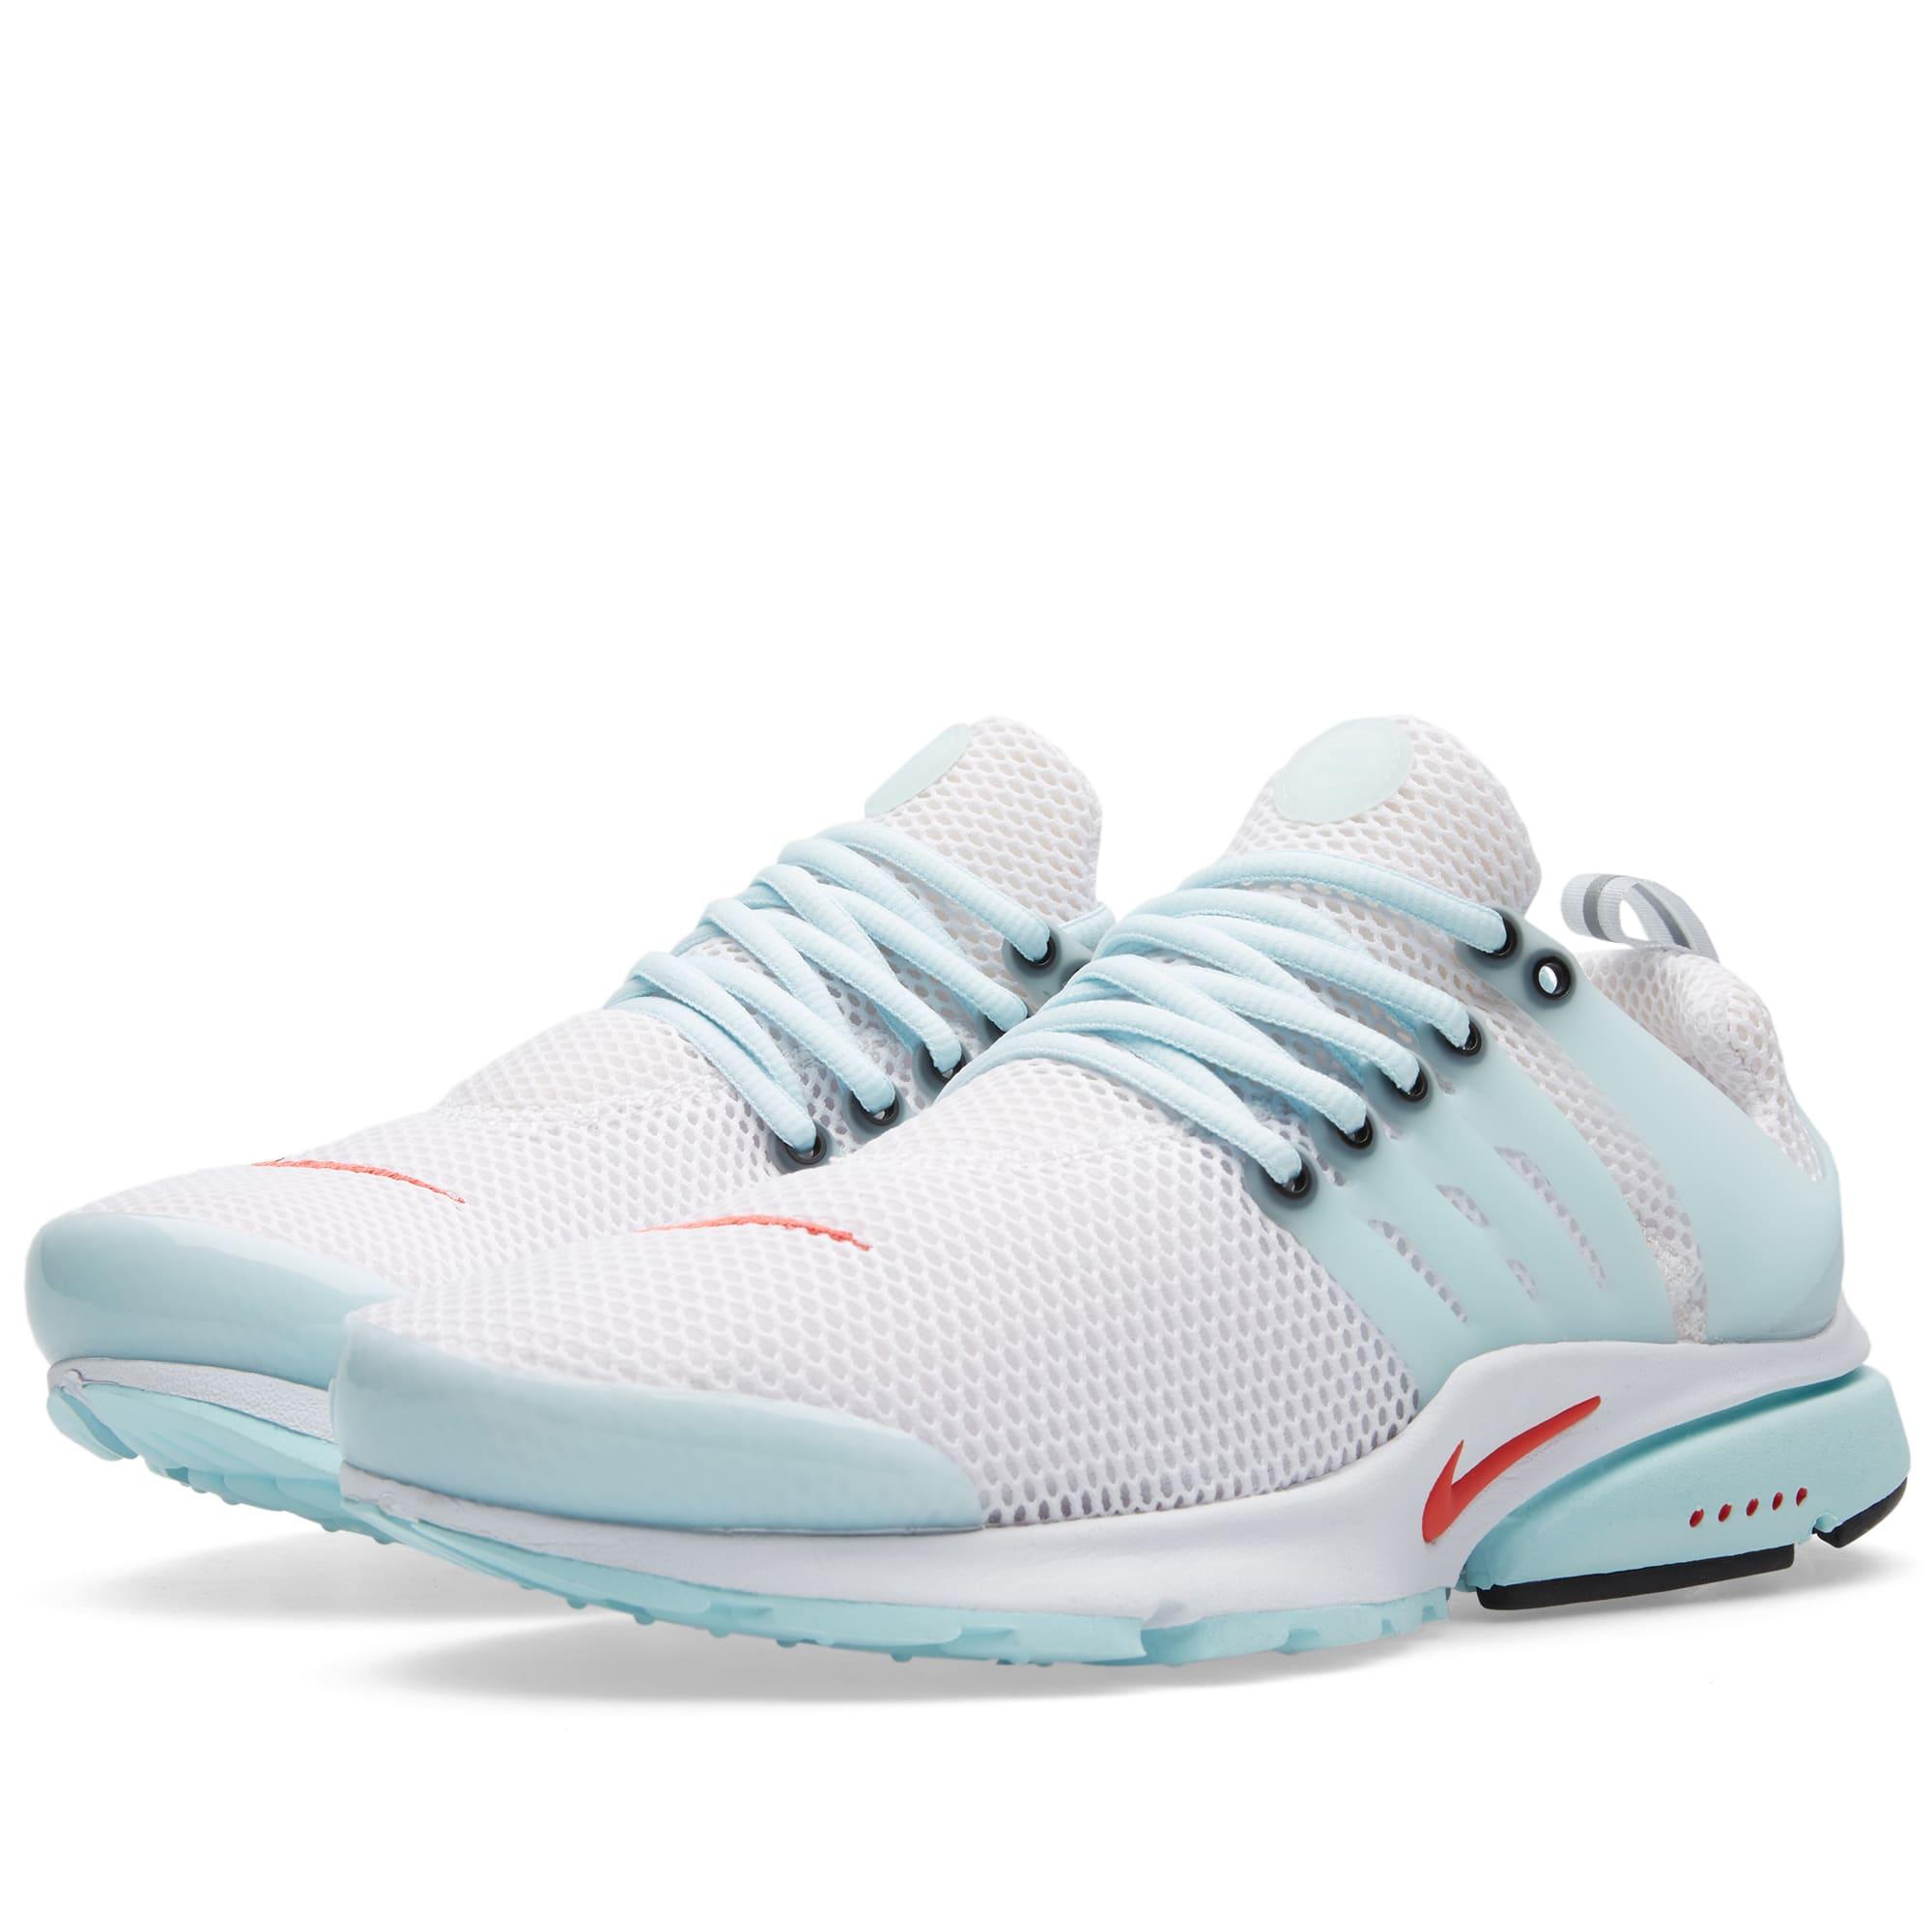 size 40 44fb8 5f6bb Nike Air Presto QS  Unholy Cumulus  White   Oriental Poppy   END.